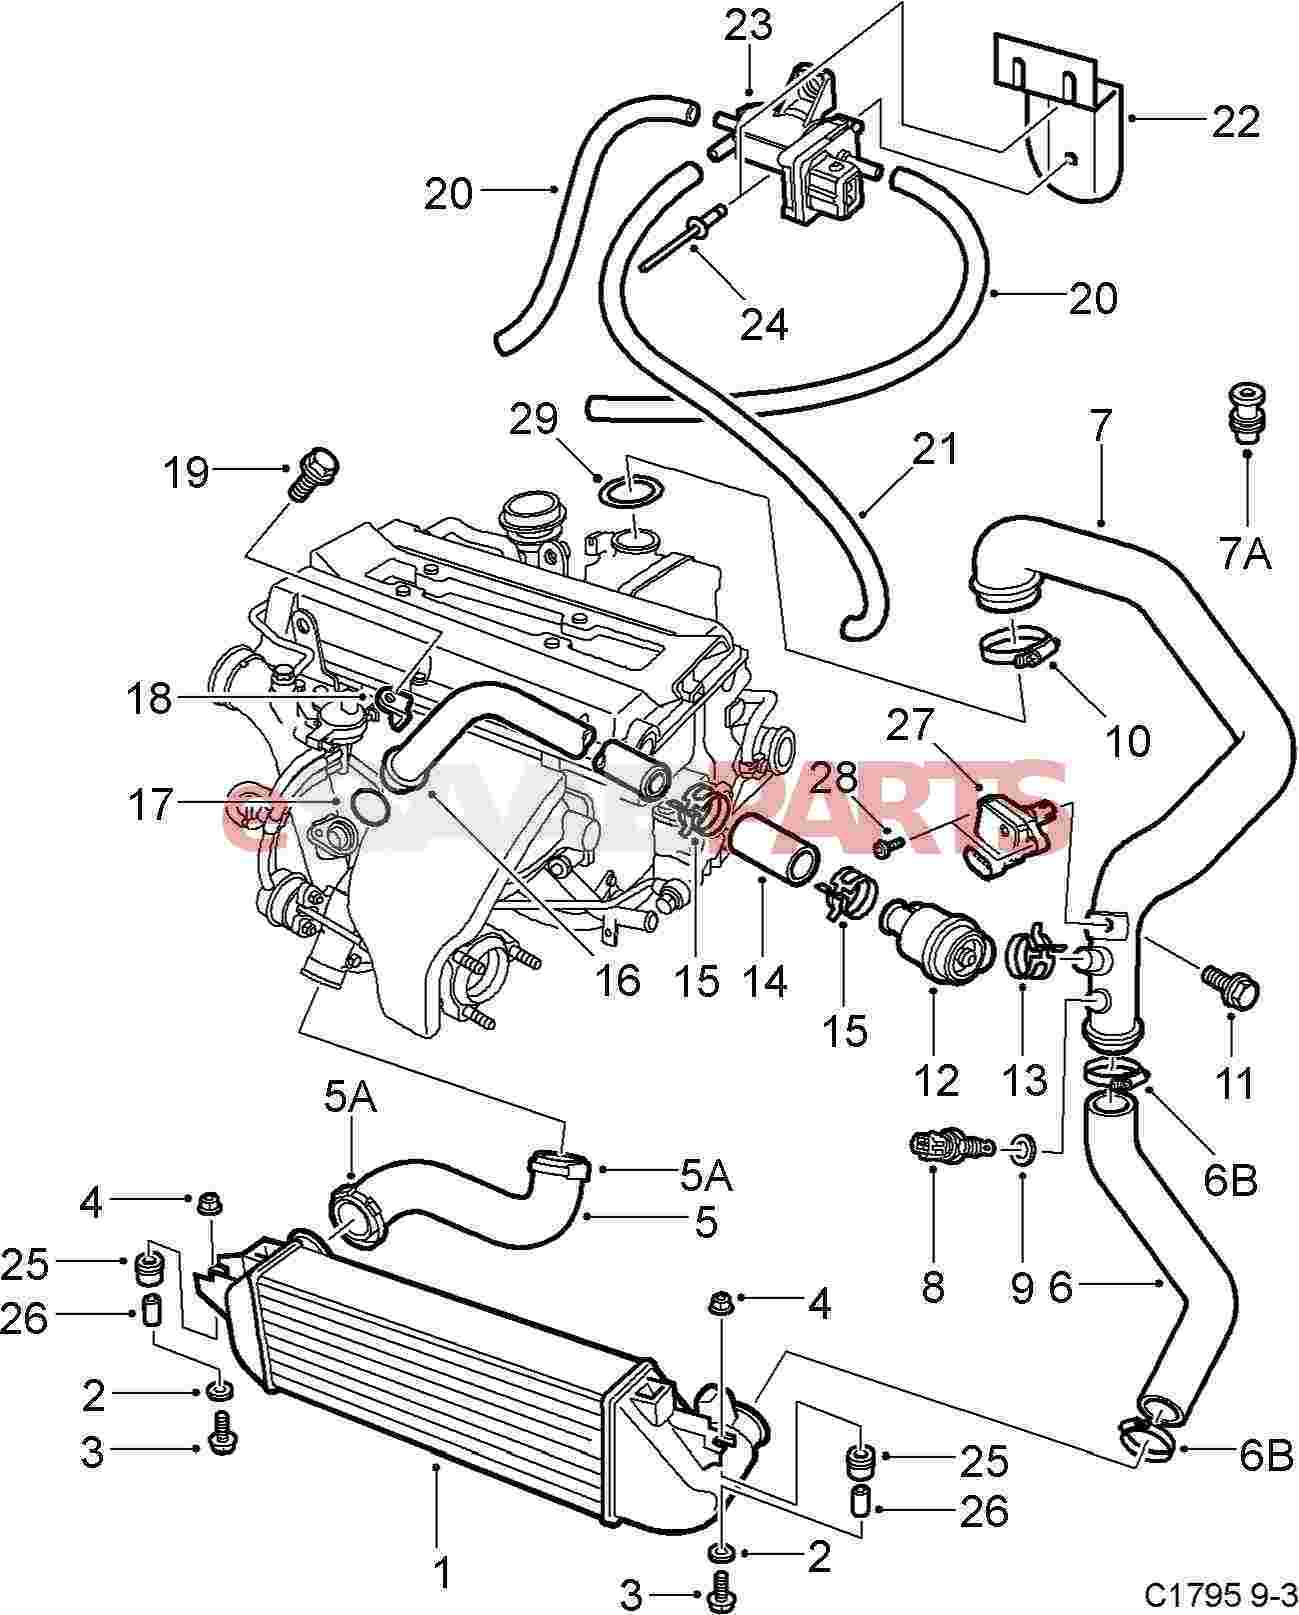 Hitachi 120 2 Manual Pump Bypass